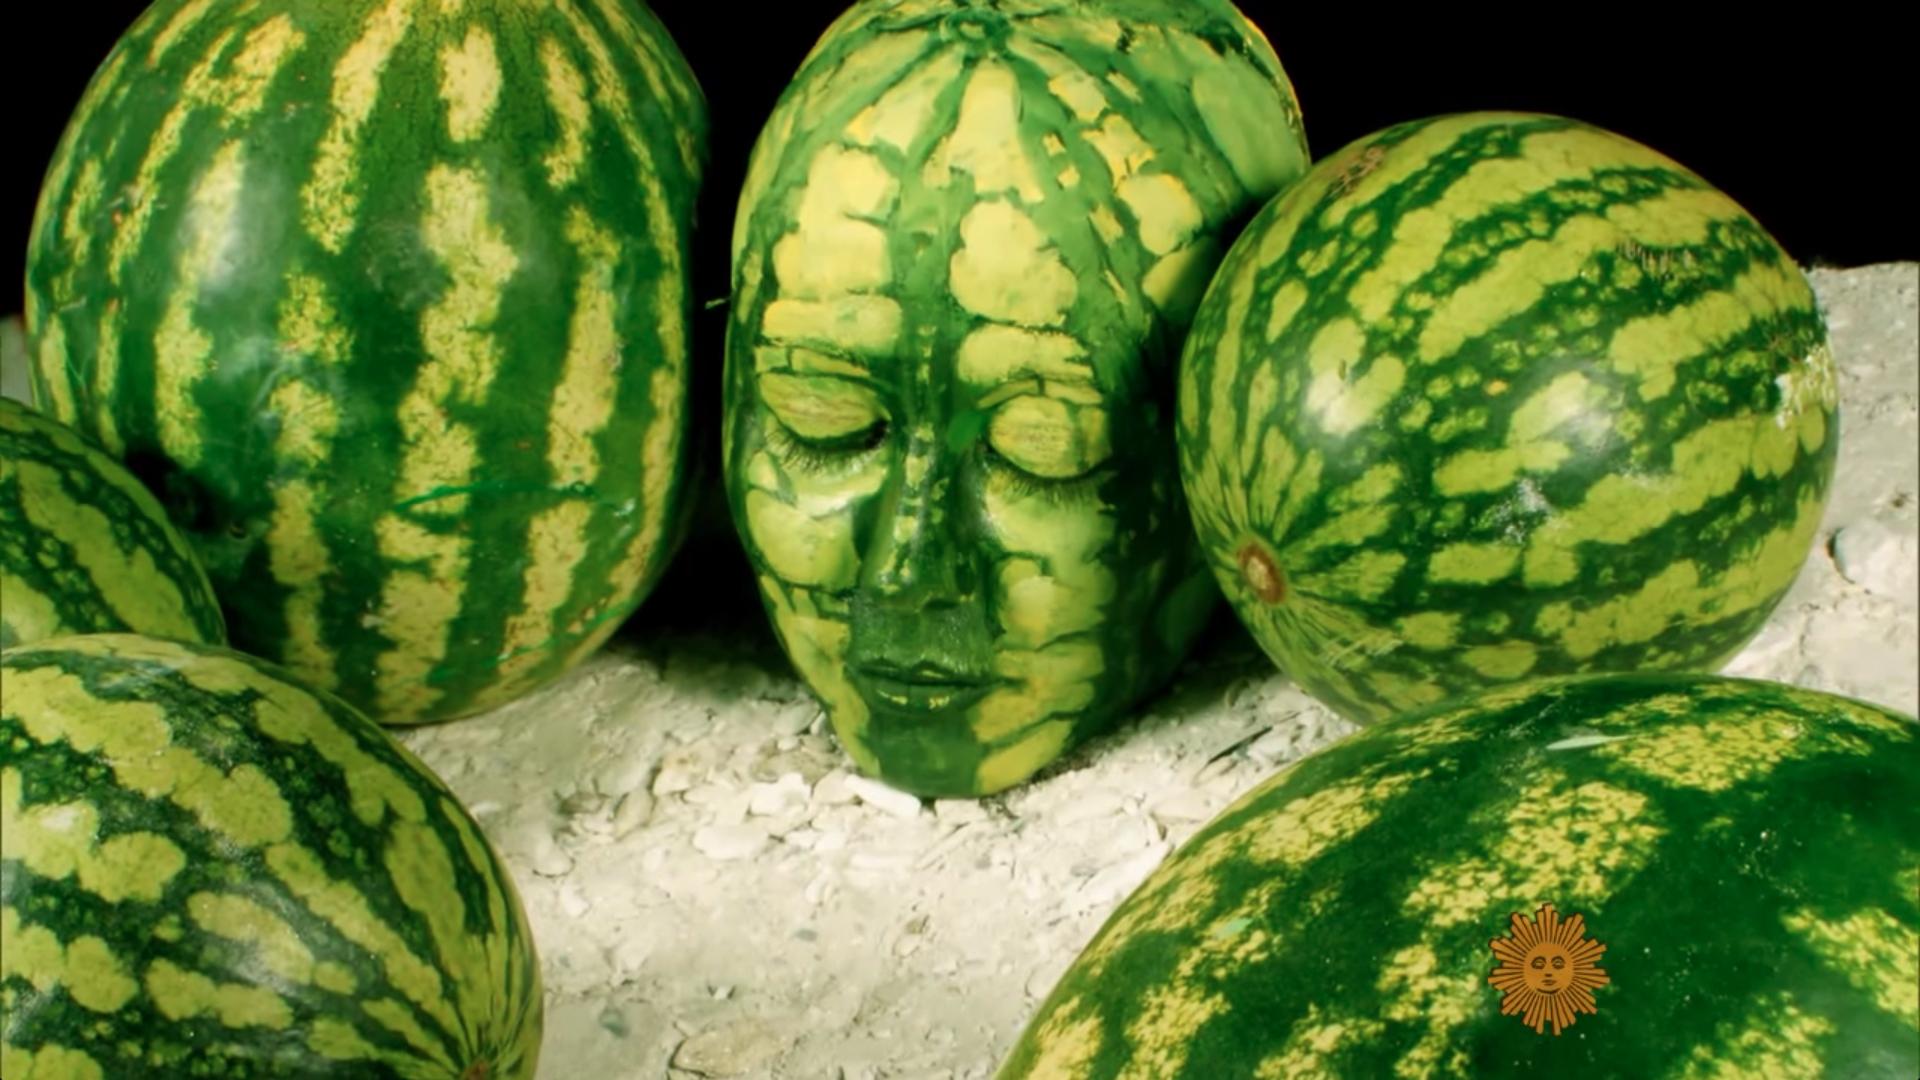 artist Johannes Stötter body paint Stotter watermelon